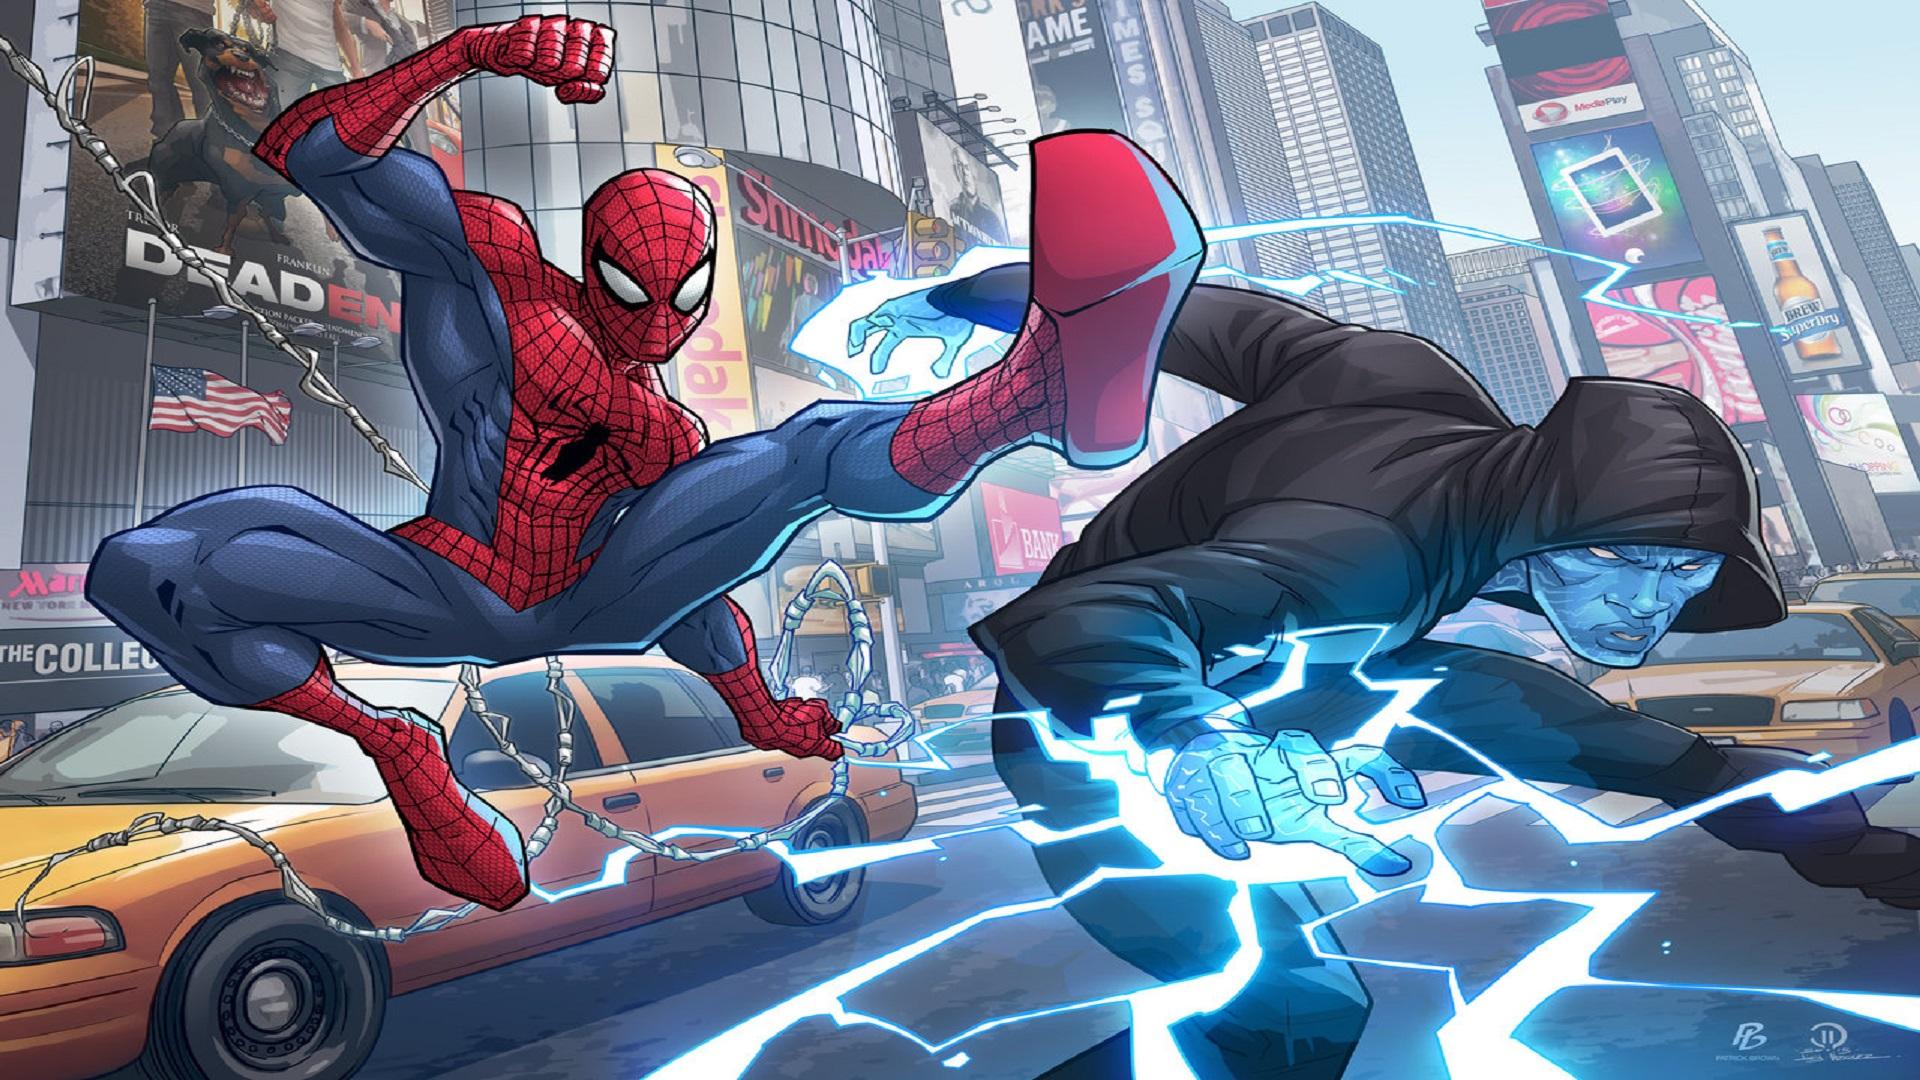 Electro Marvel Comics Spider Man The Amazing Spider Man 2 1920x1080